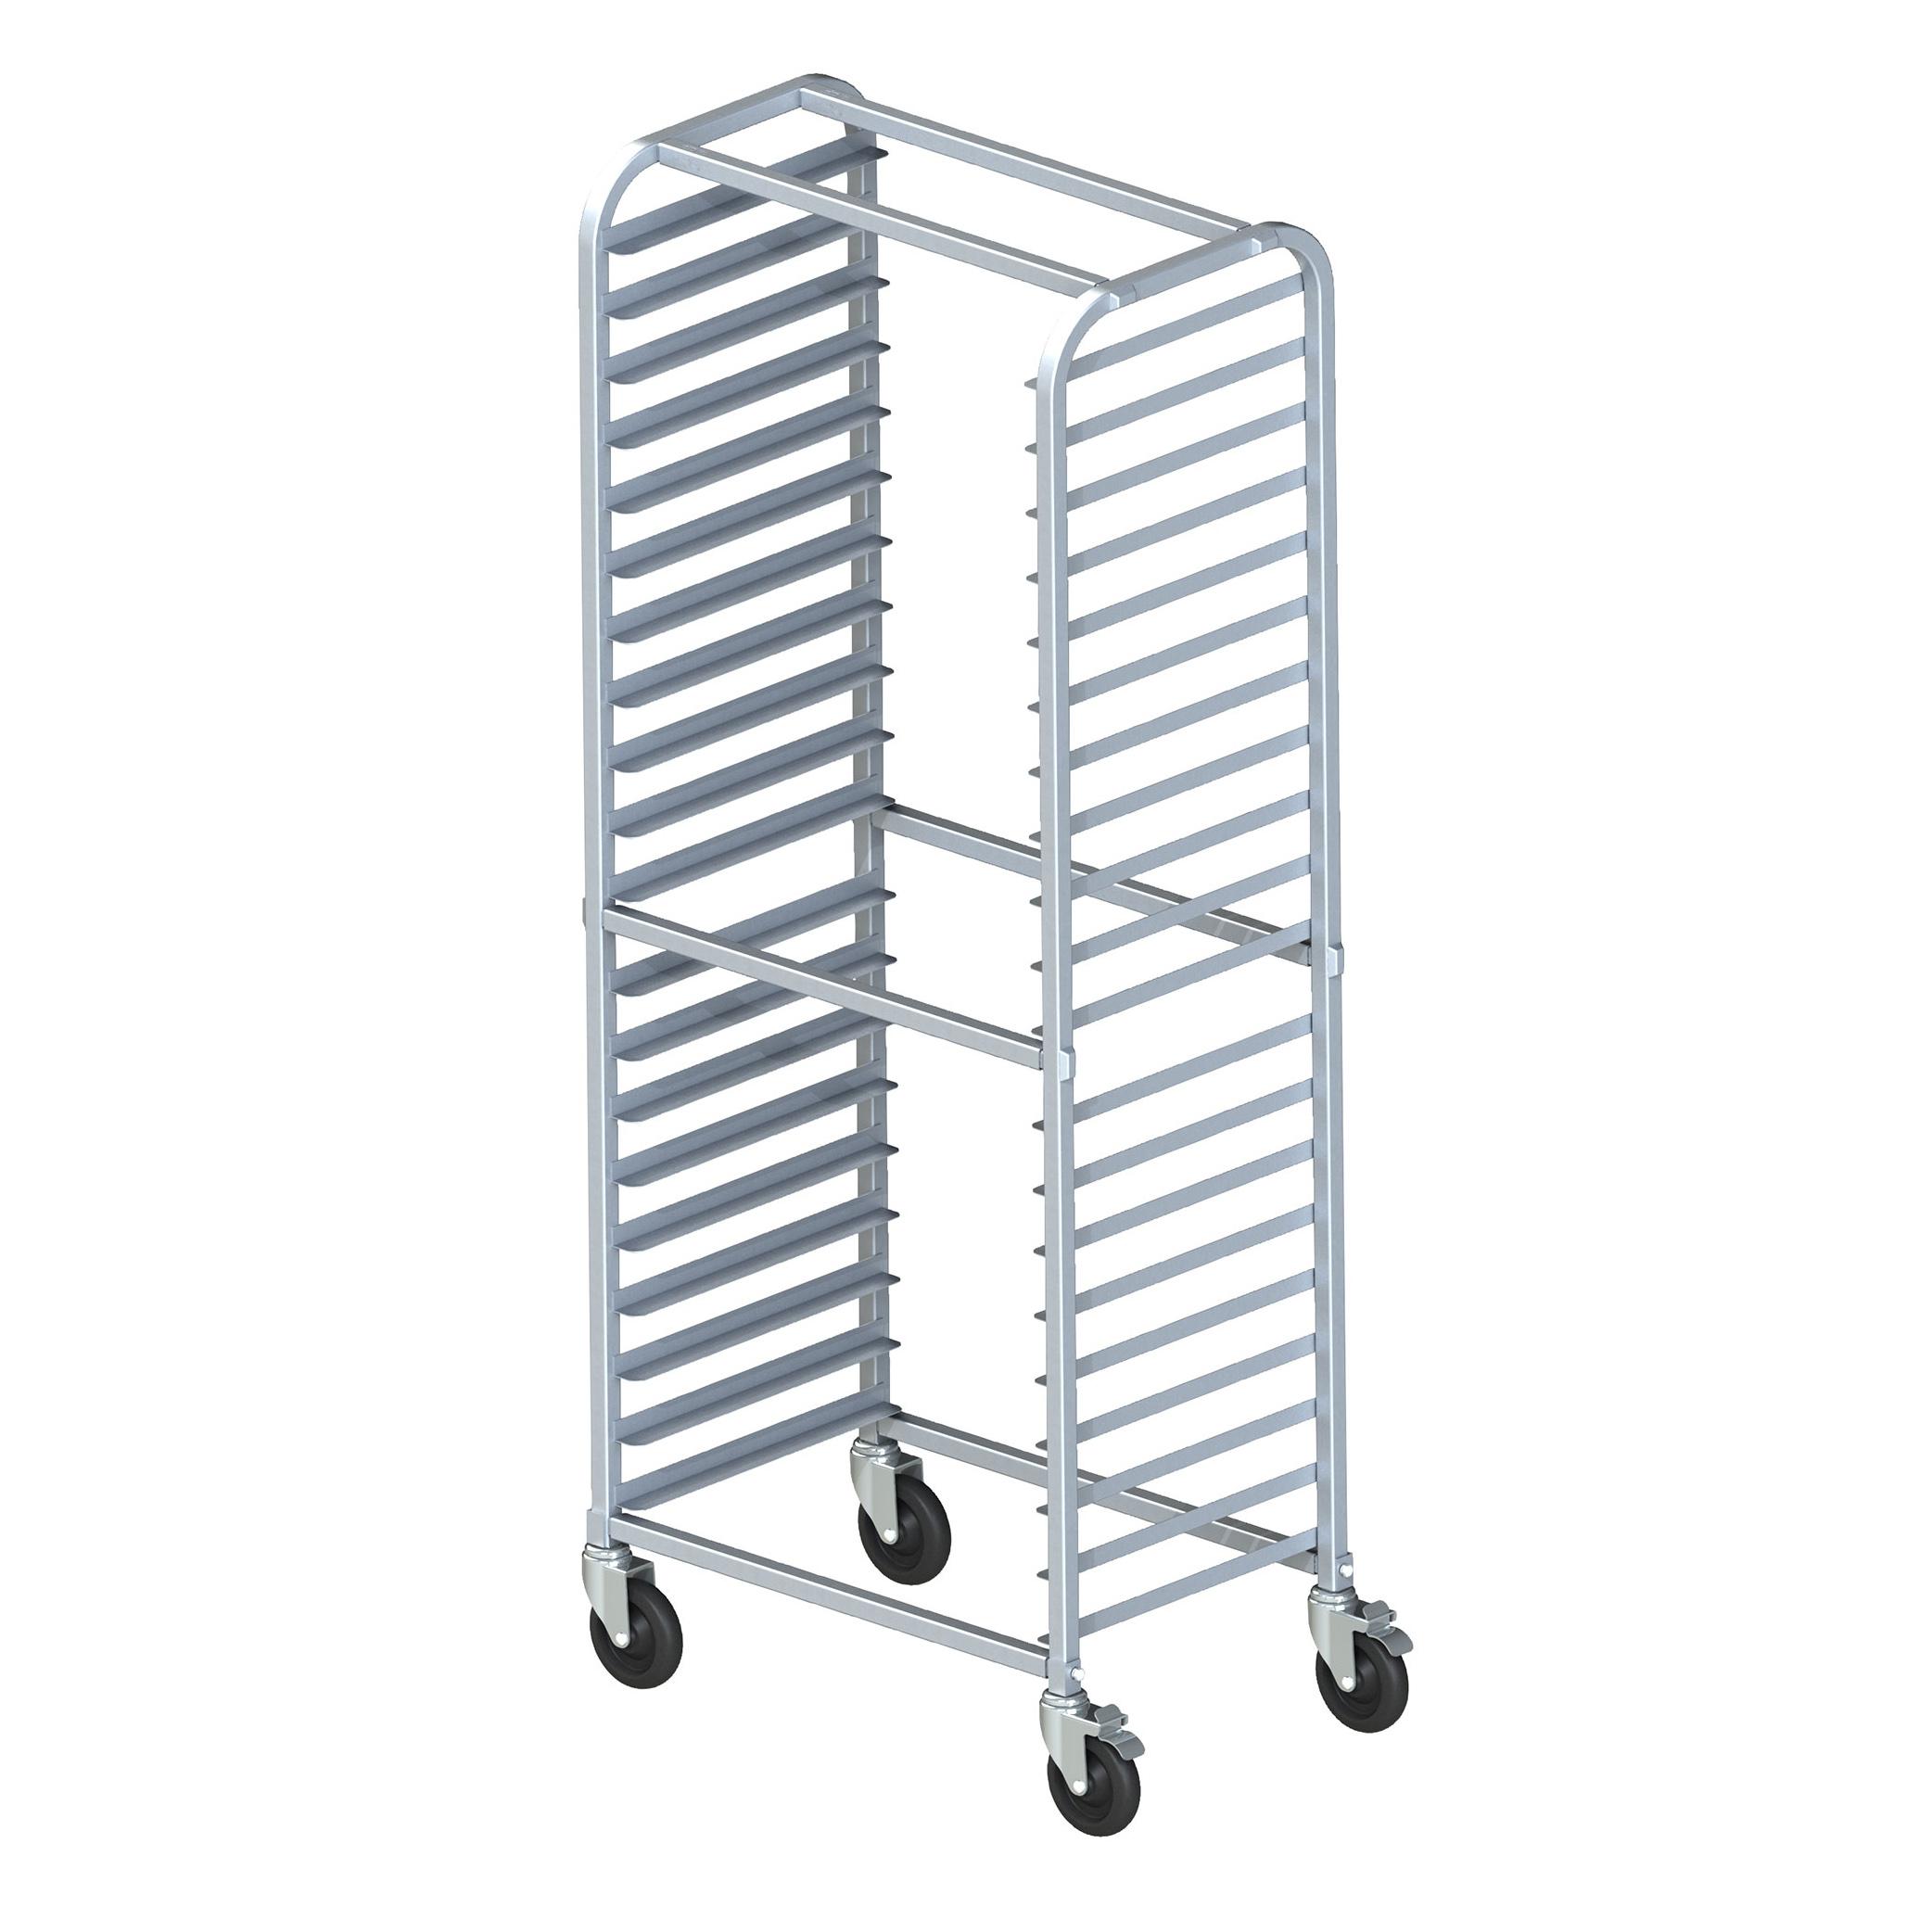 Winco ALRS-20BK pan rack, universal